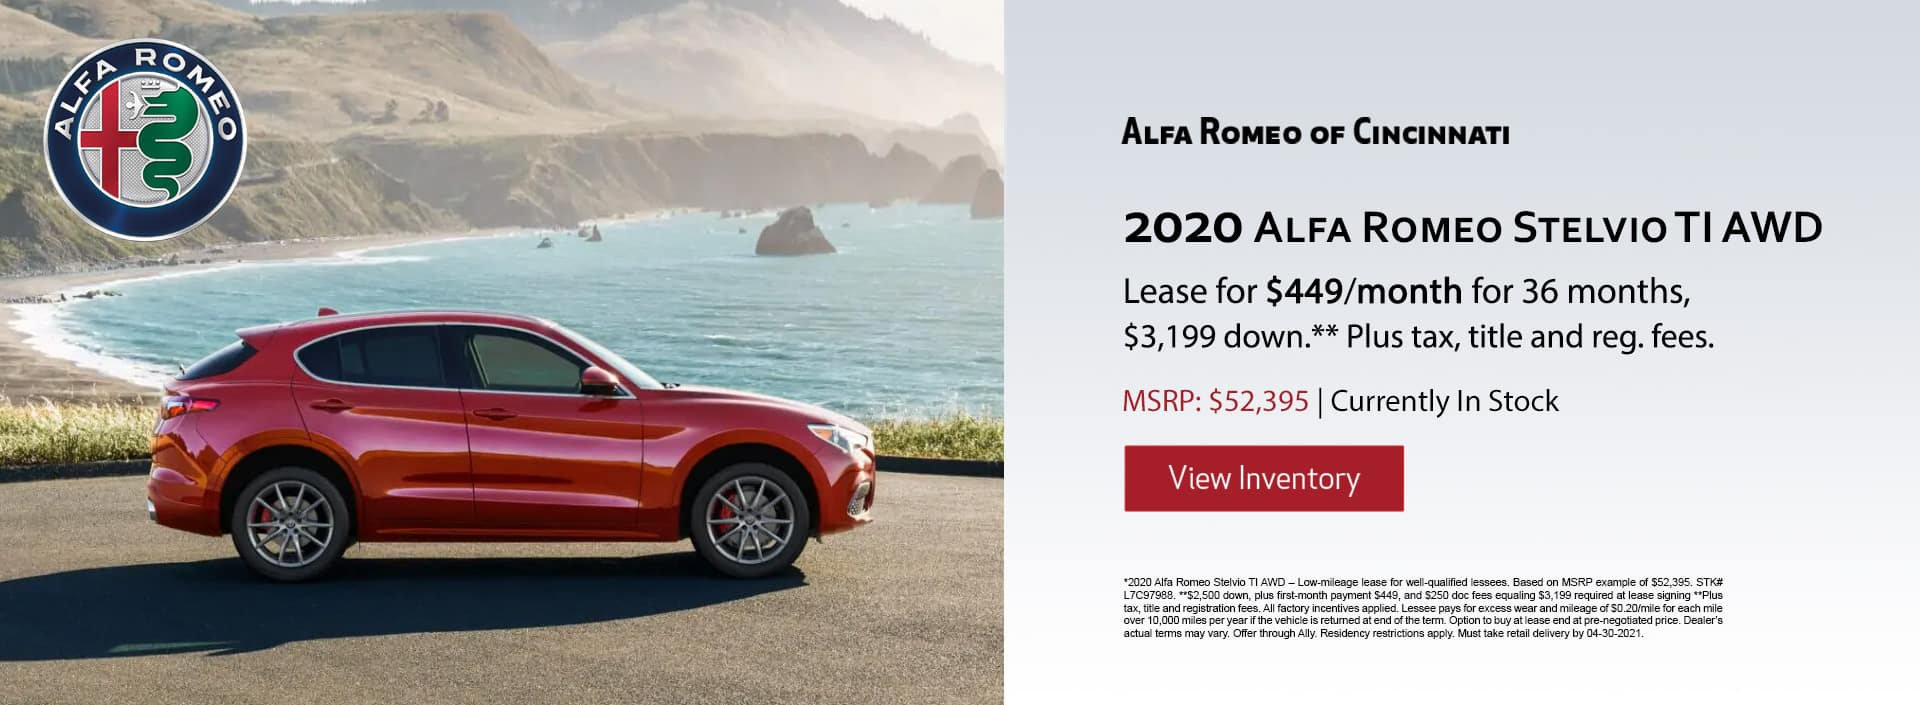 Alfa Romeo Stelvio Lease